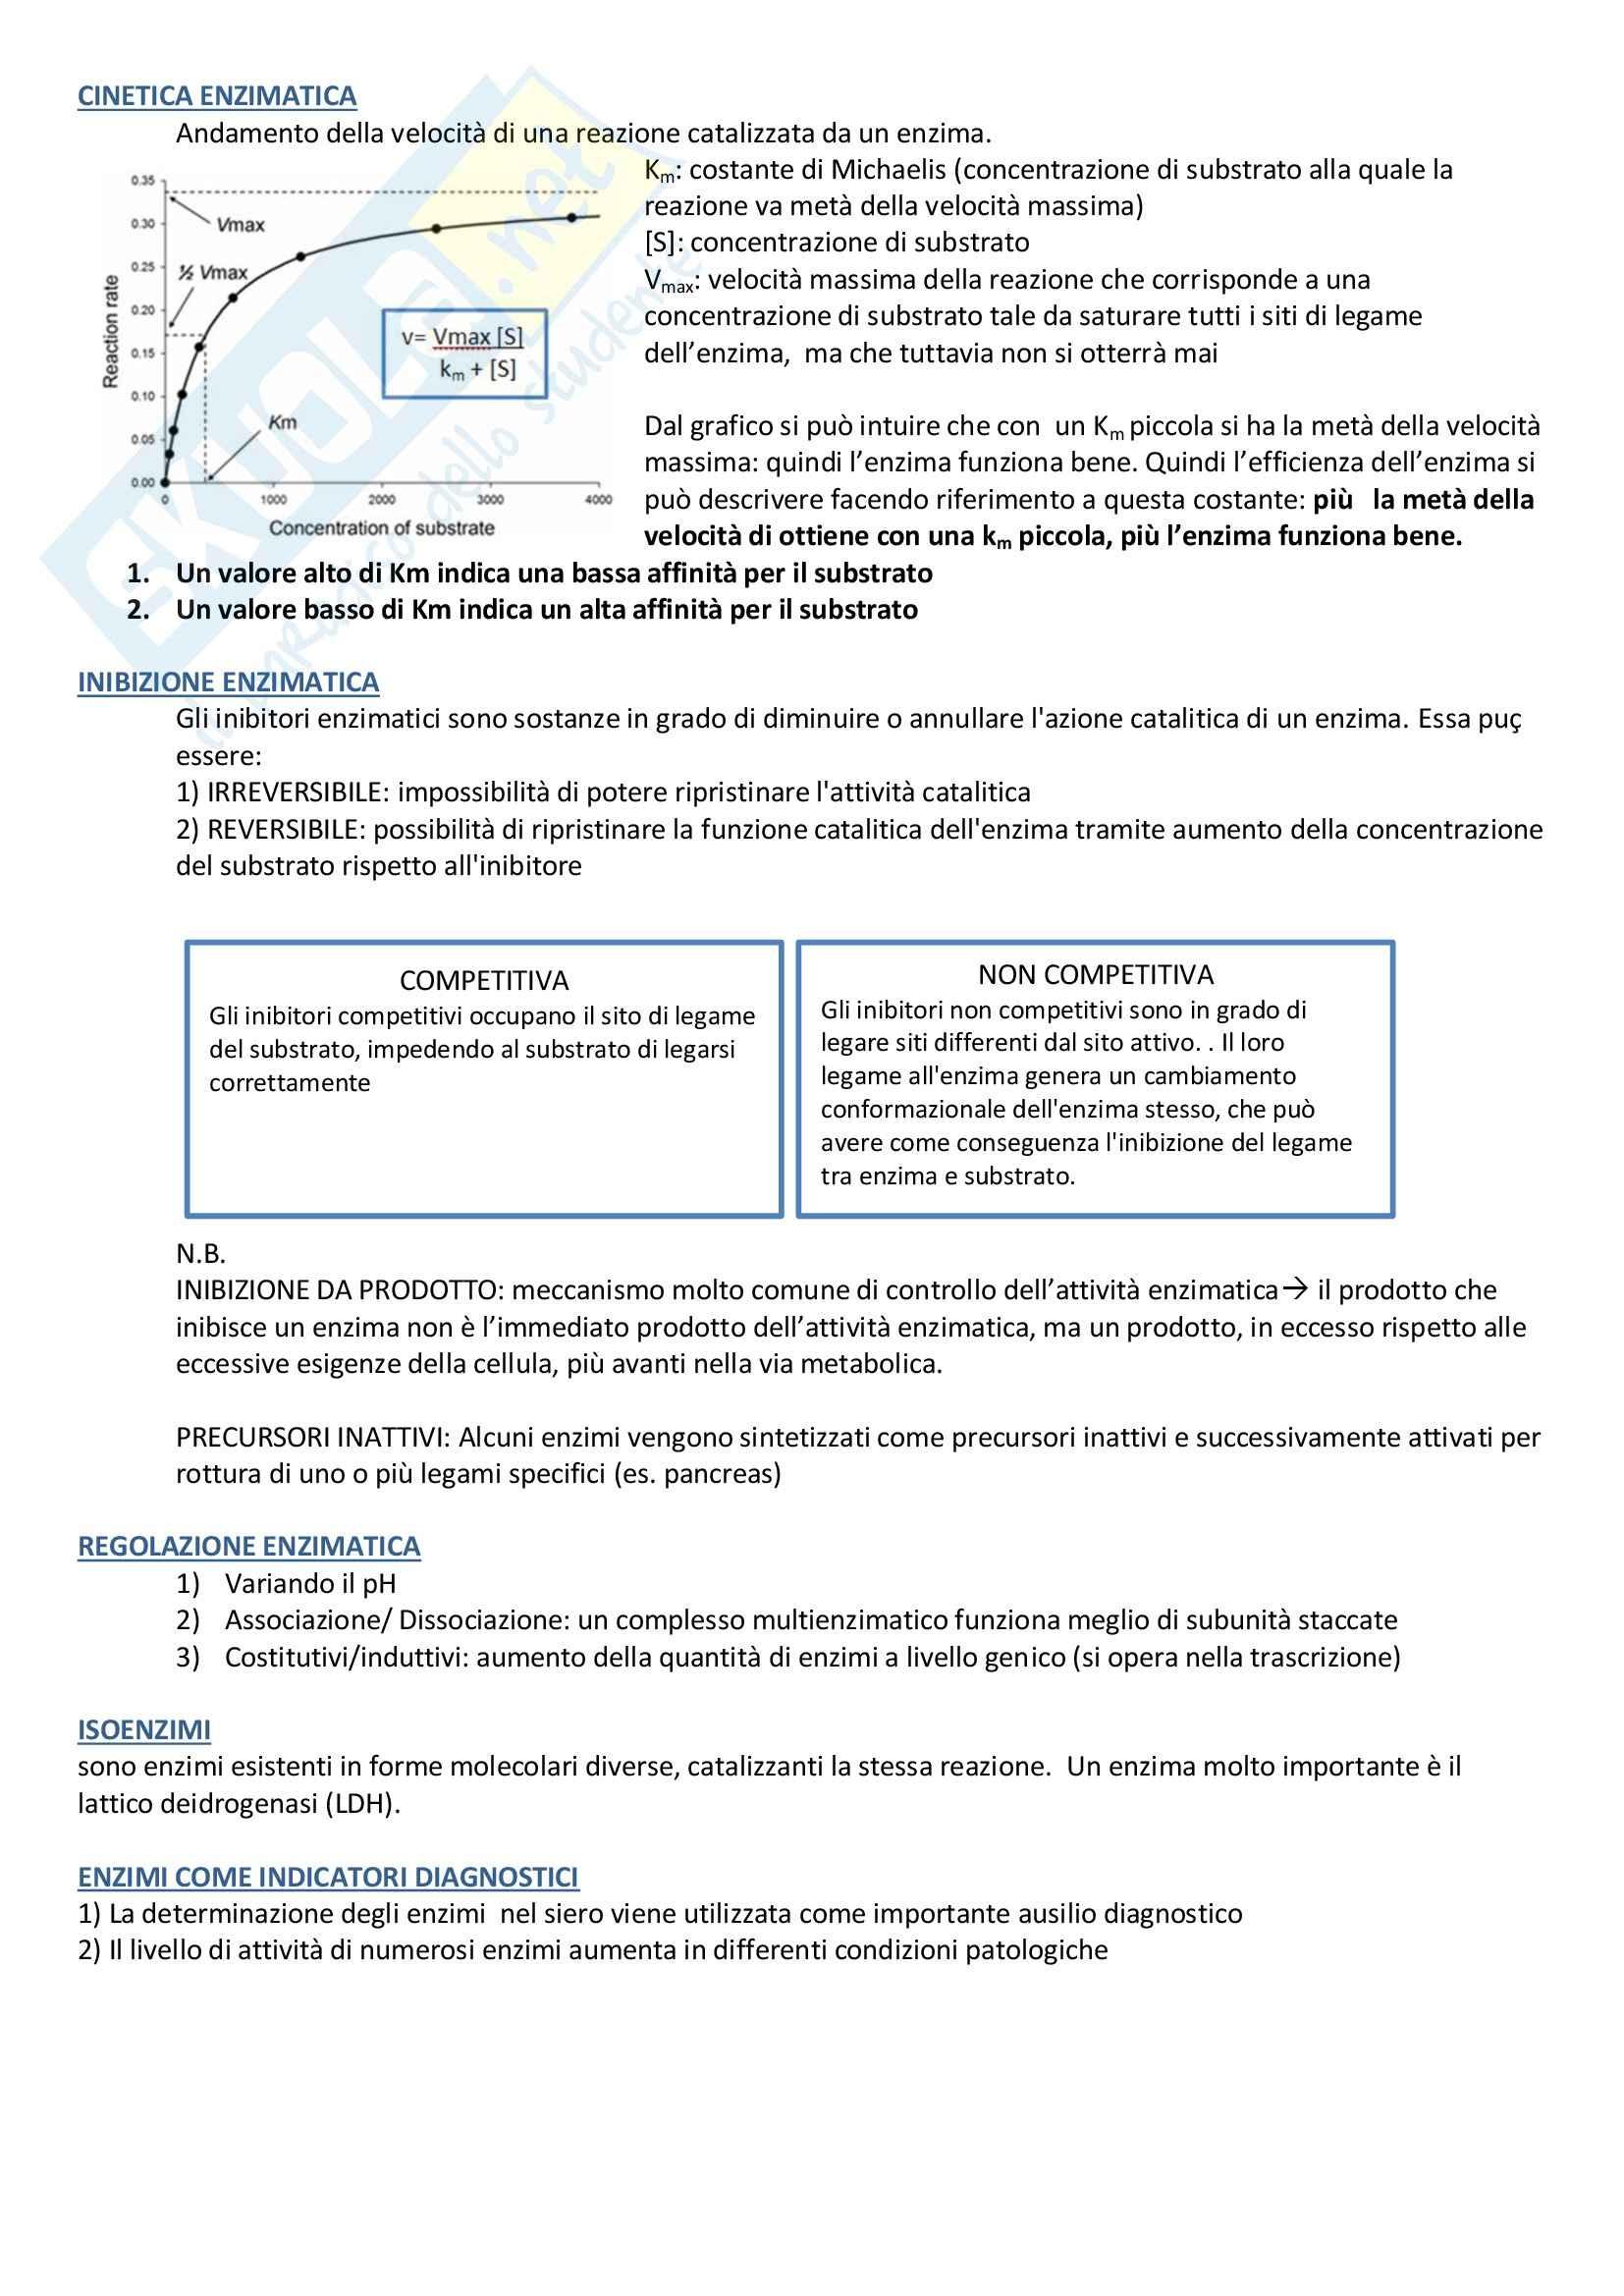 Riassunto esame Biochimica, prof. Palestini Pag. 2